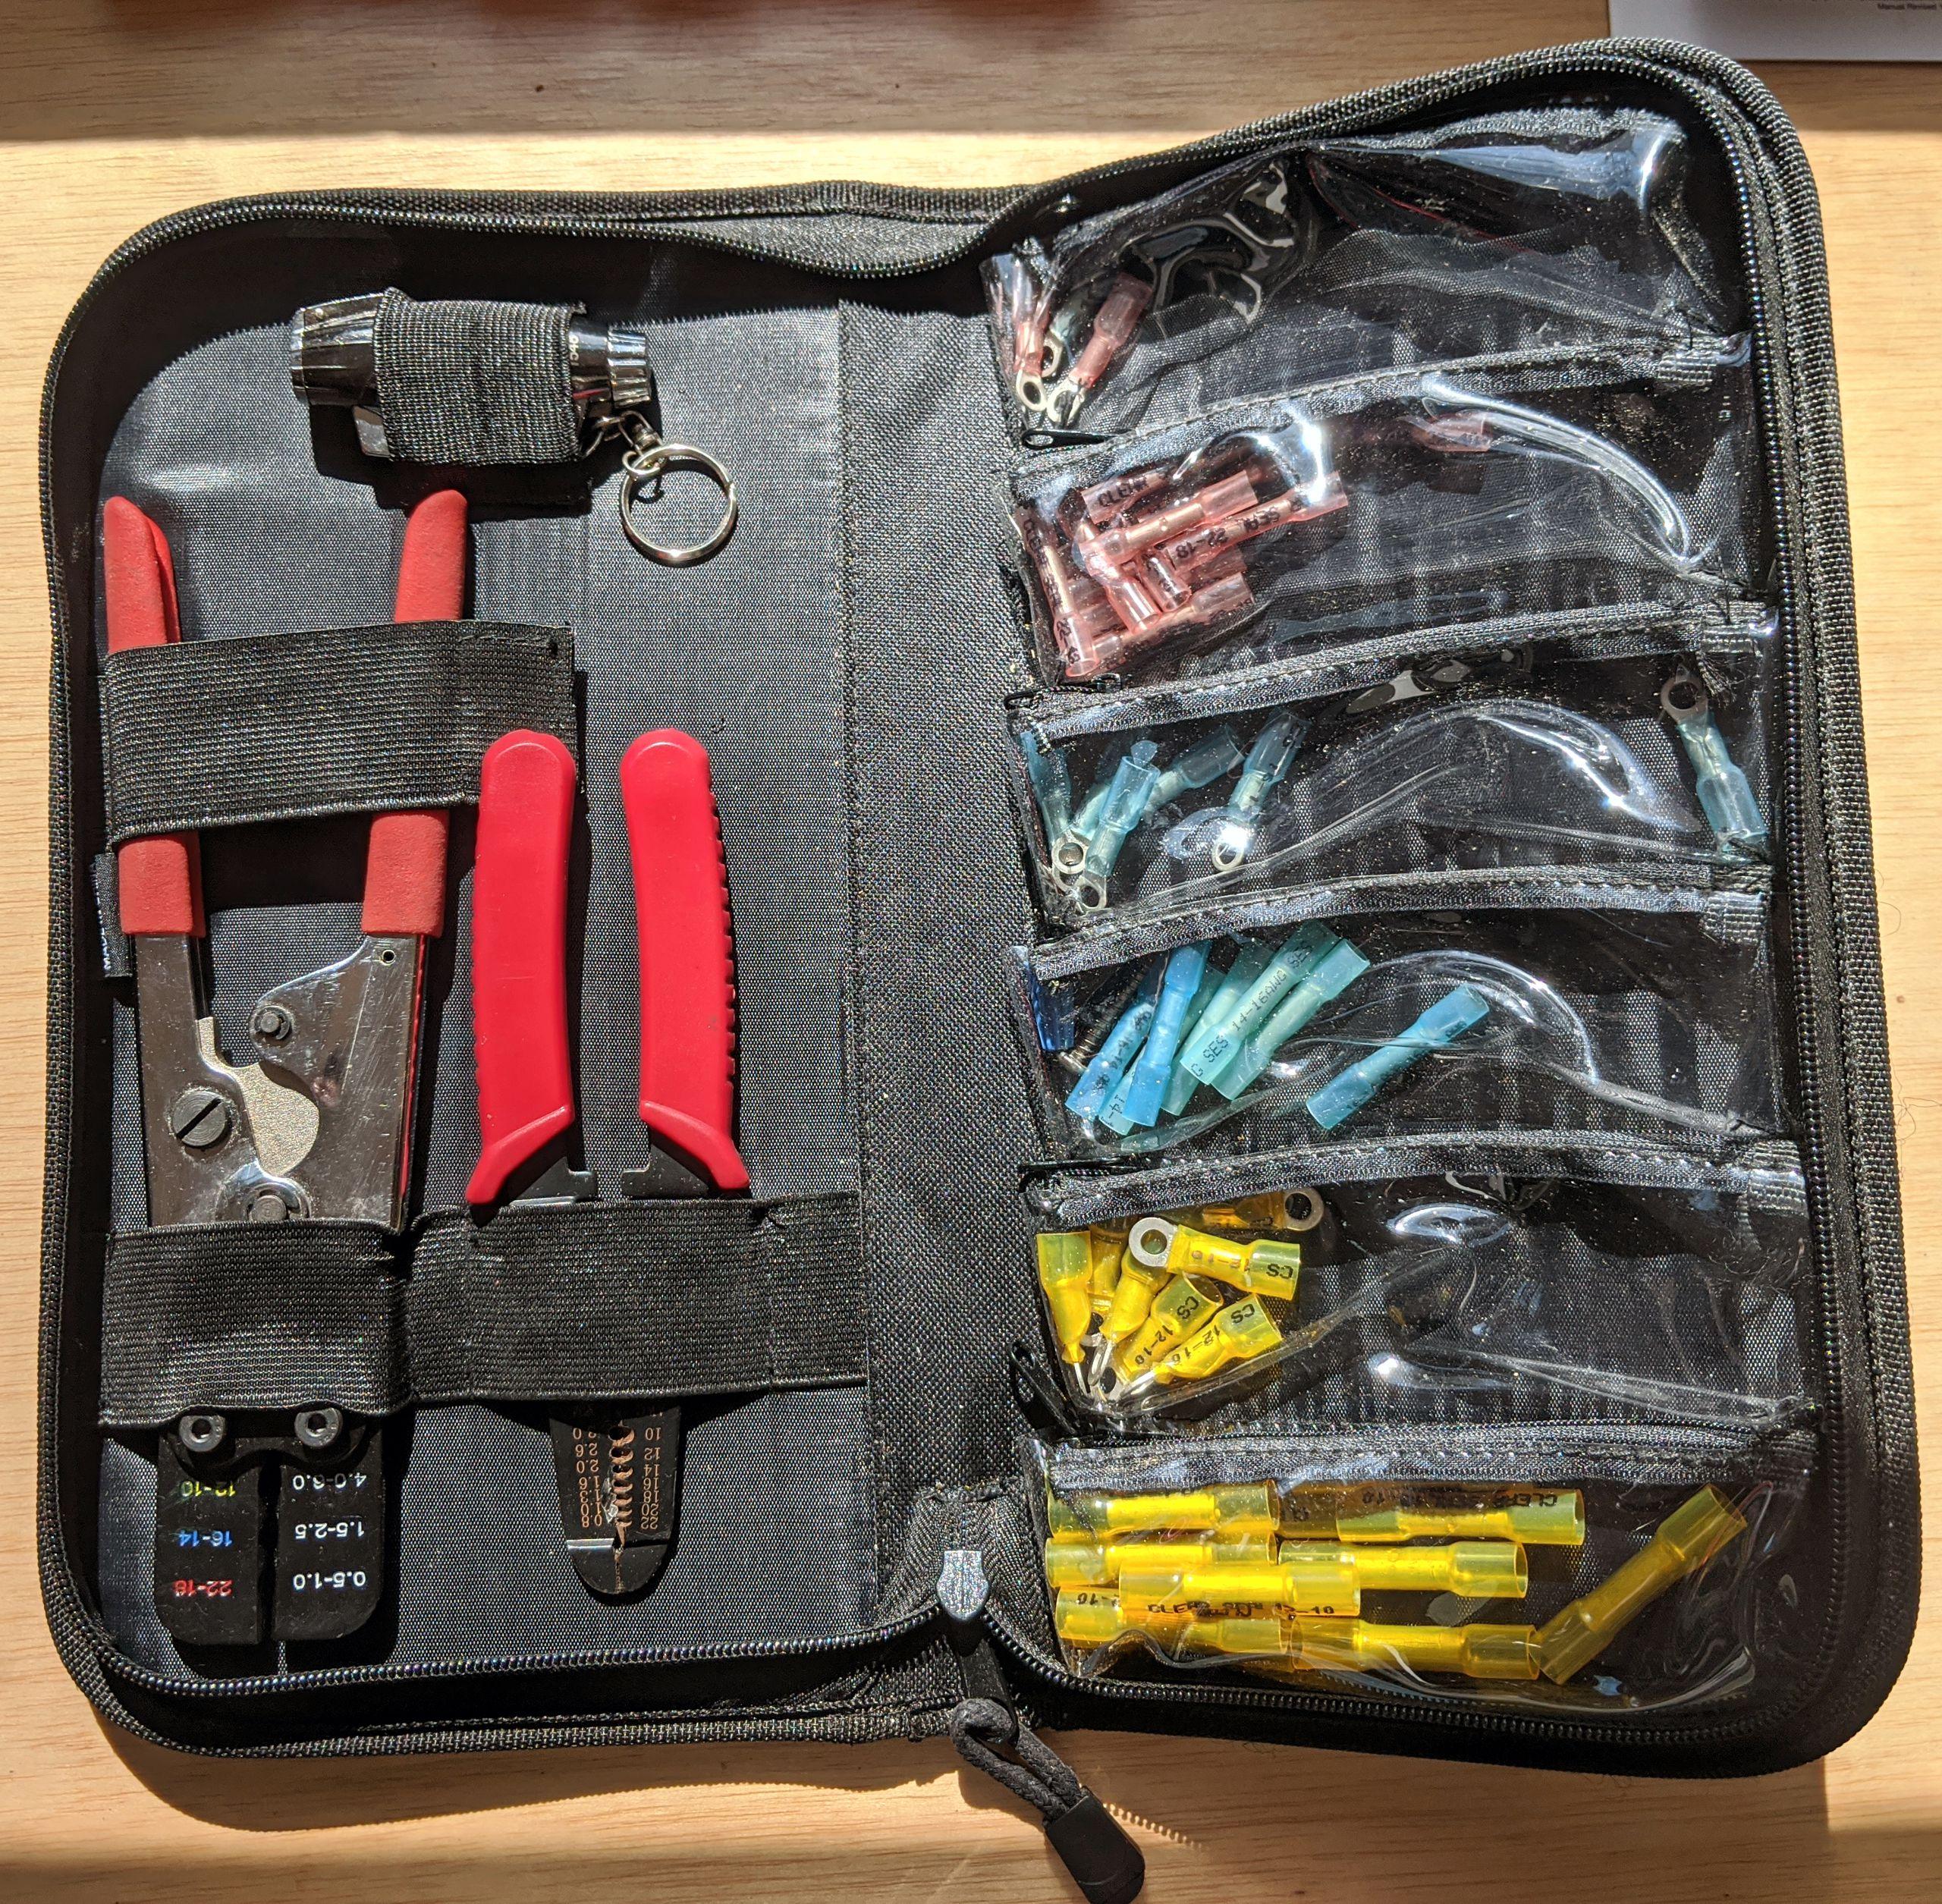 BSP heat shrink terminal kit